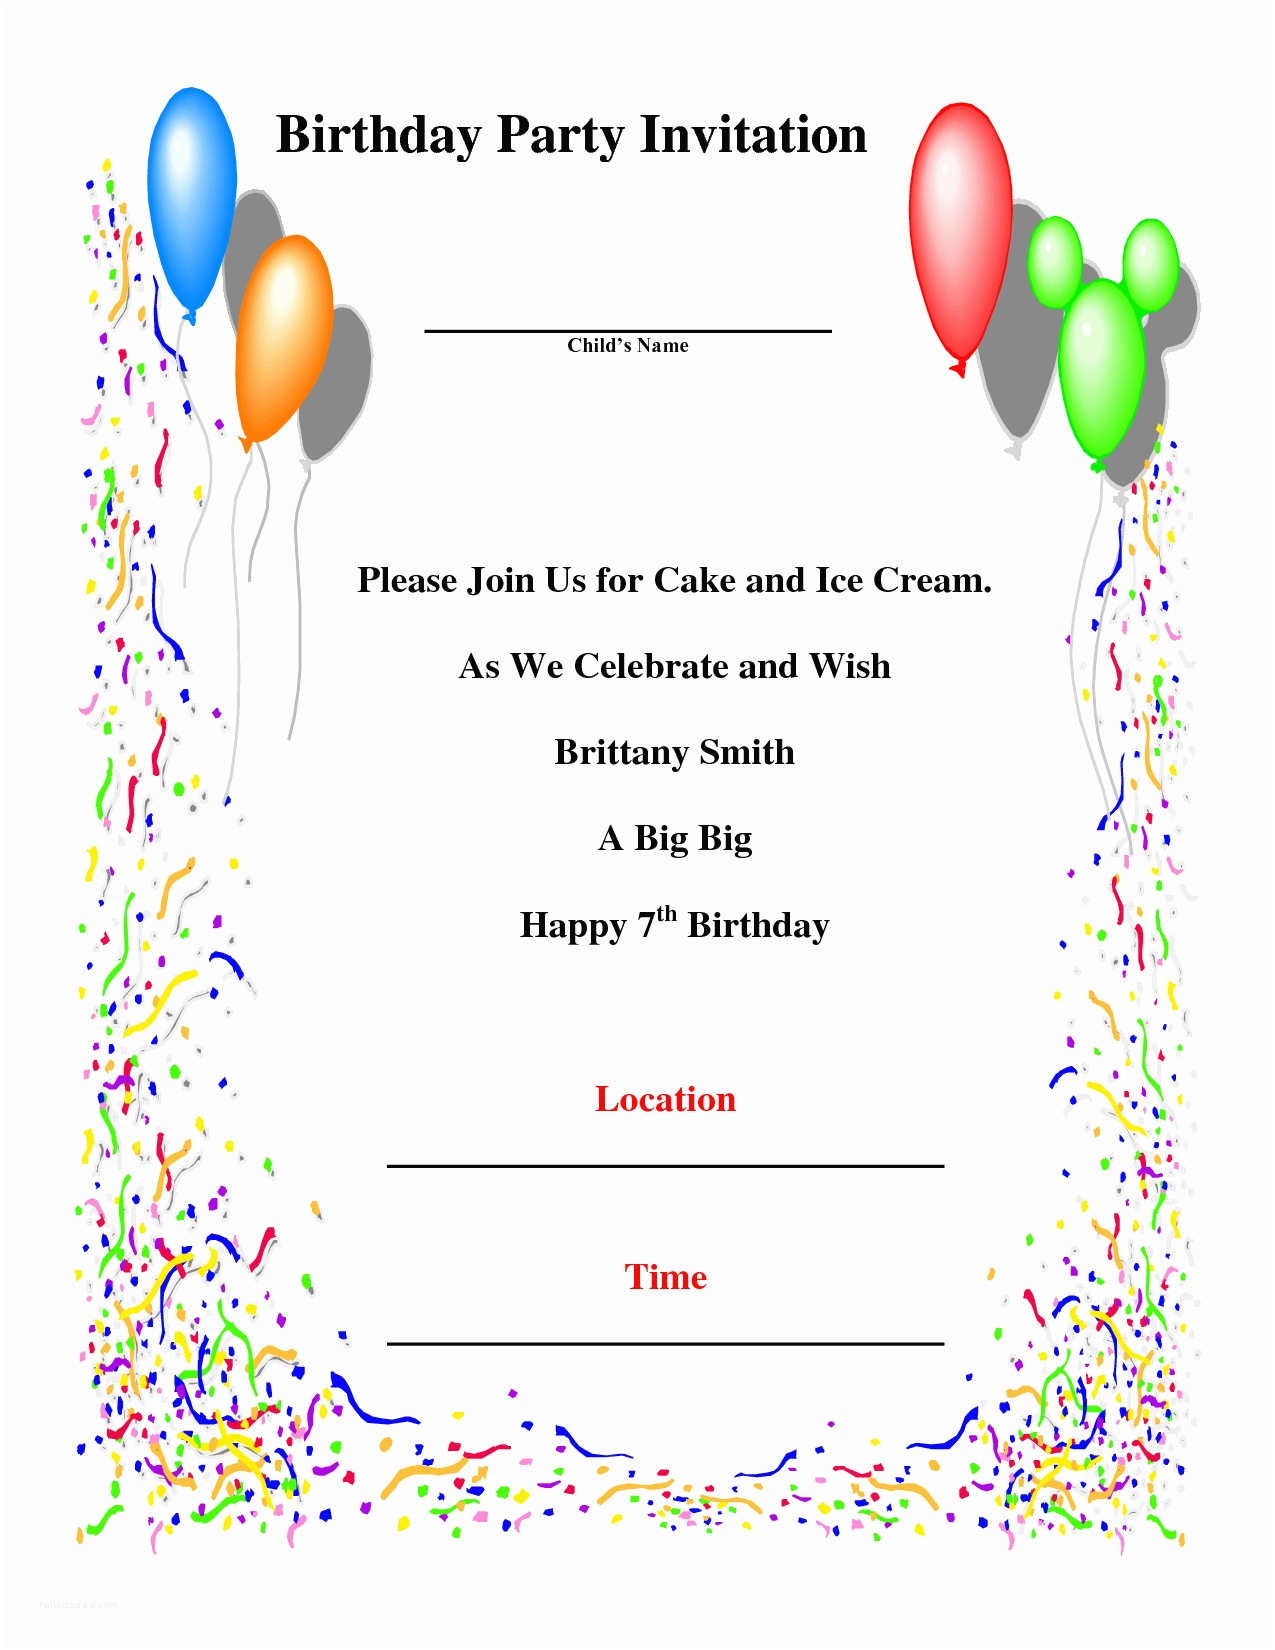 Party Invitation Sample Birthday Party Invitations Template